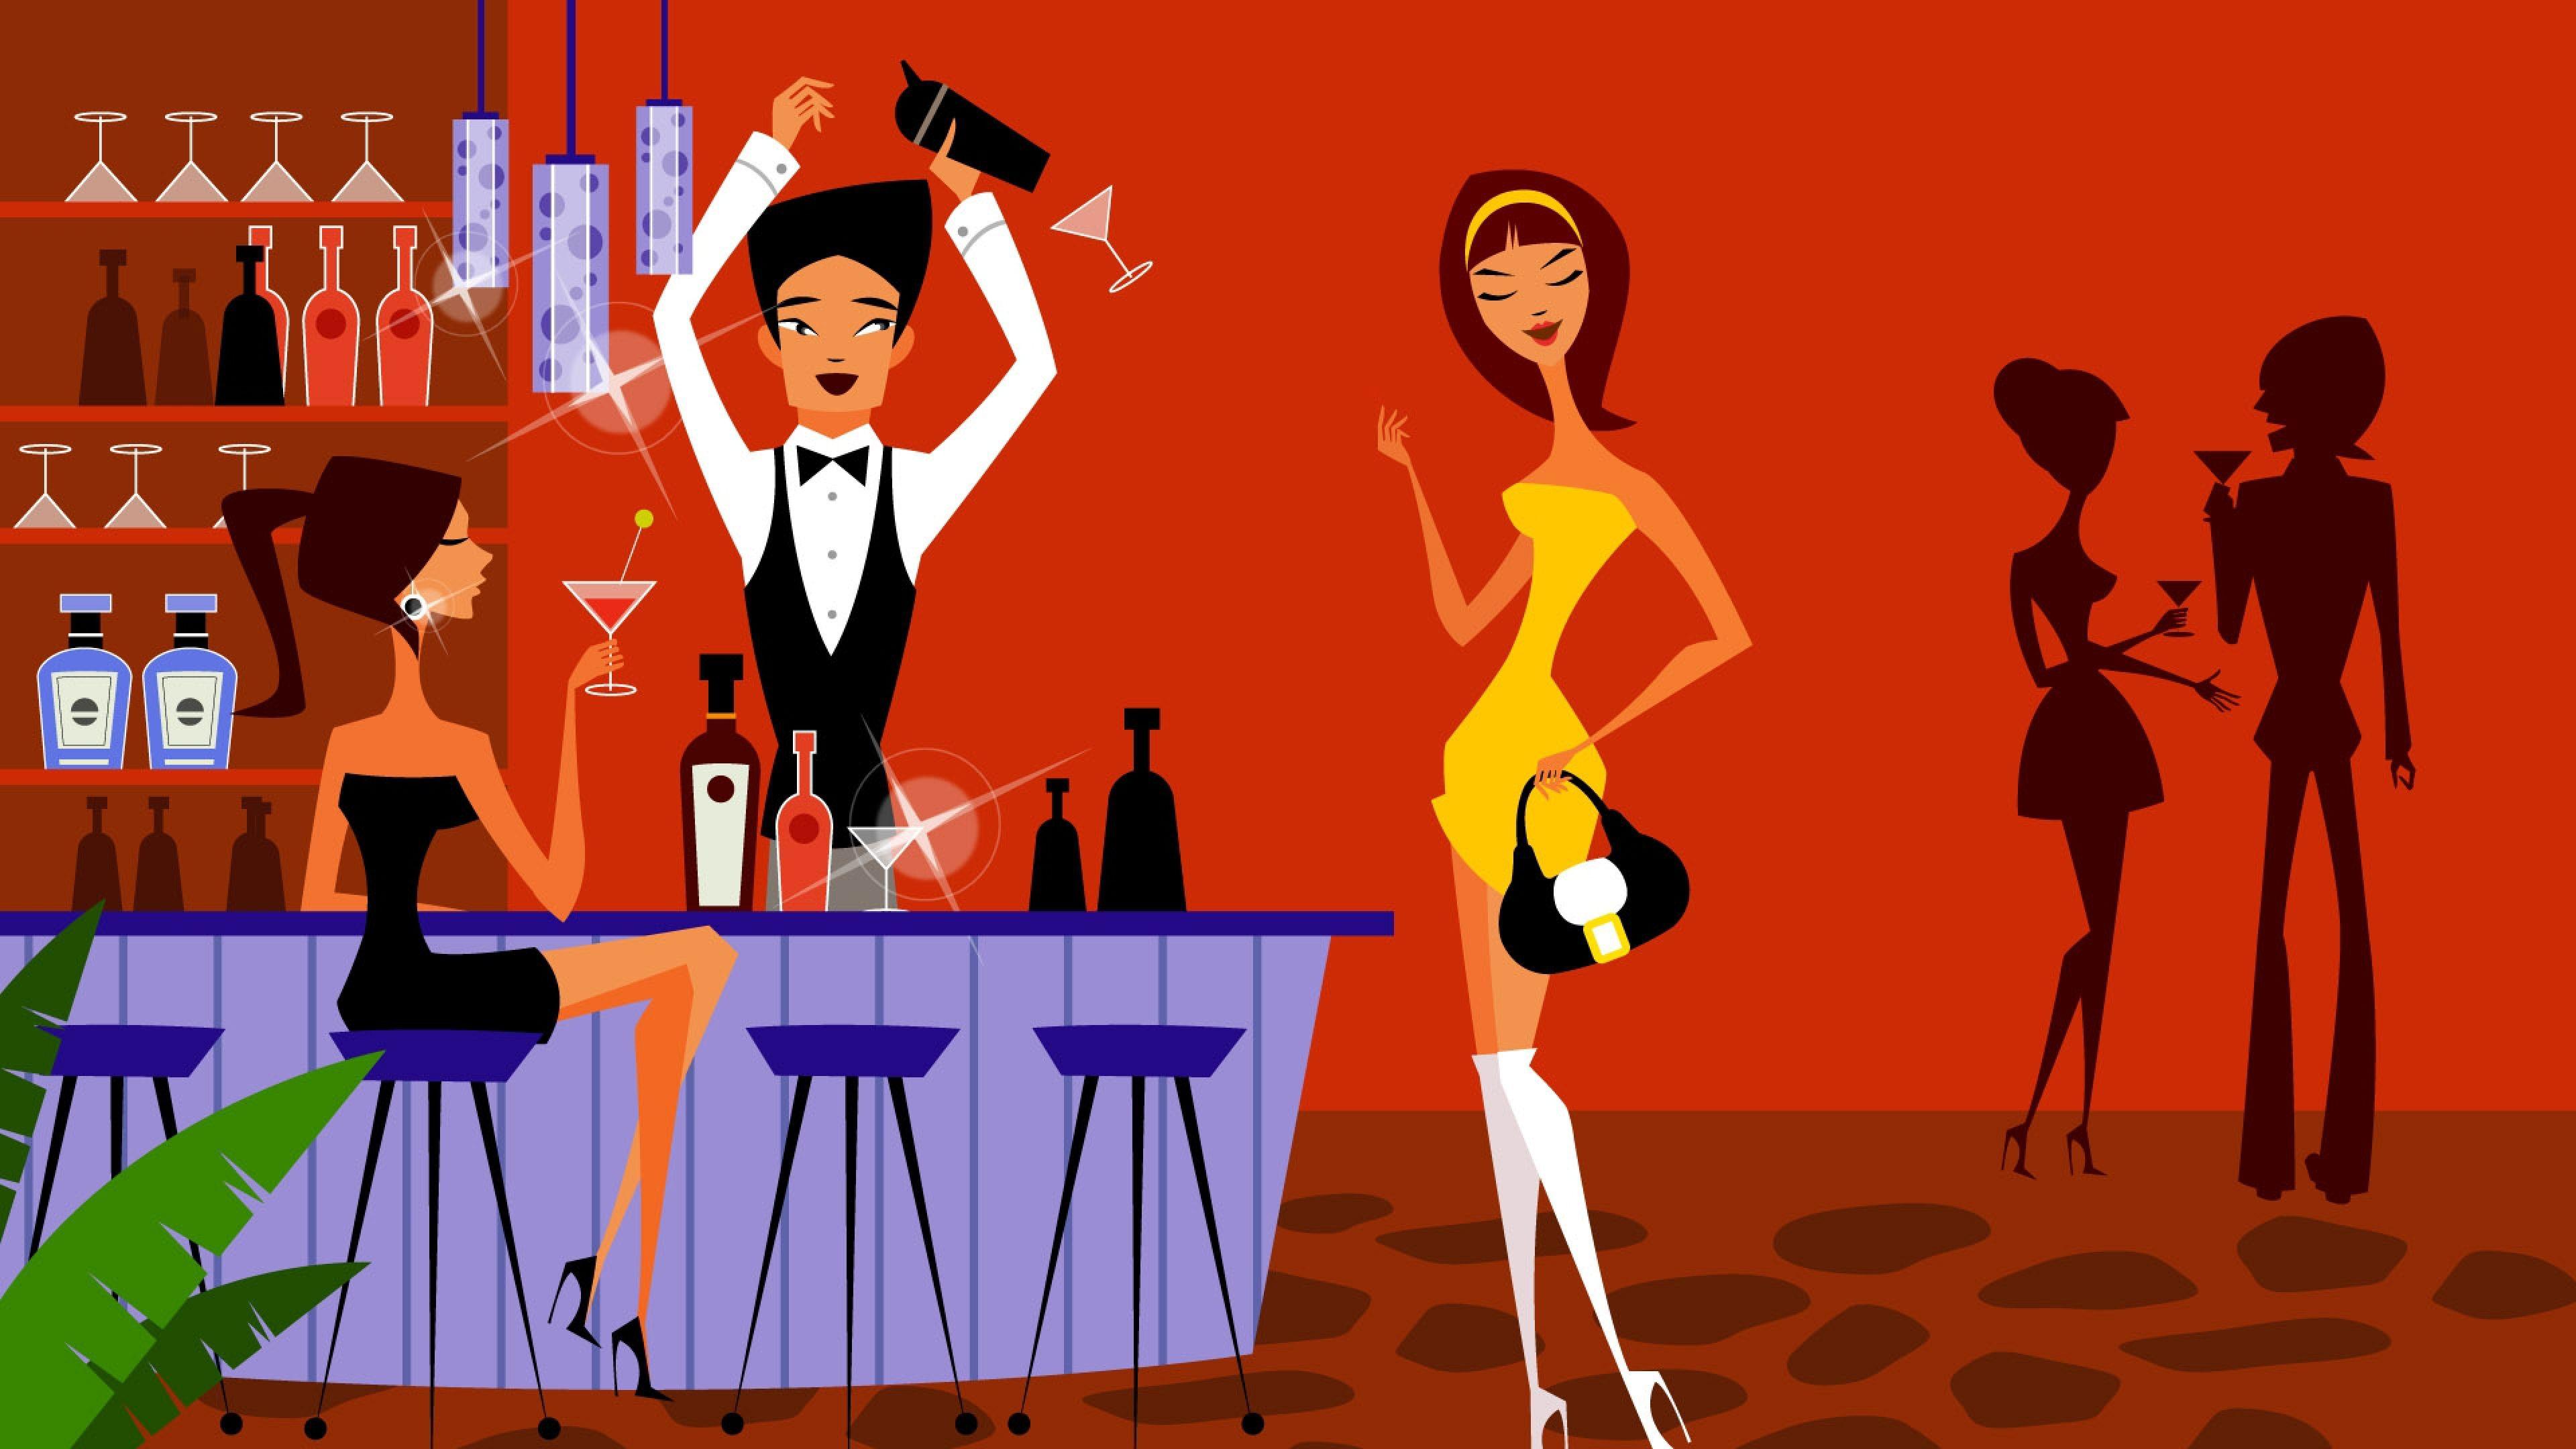 bar_disco_people_dancing_drinks_bartender_cocktails_57074_3840x2160.jpg (3840×2160)